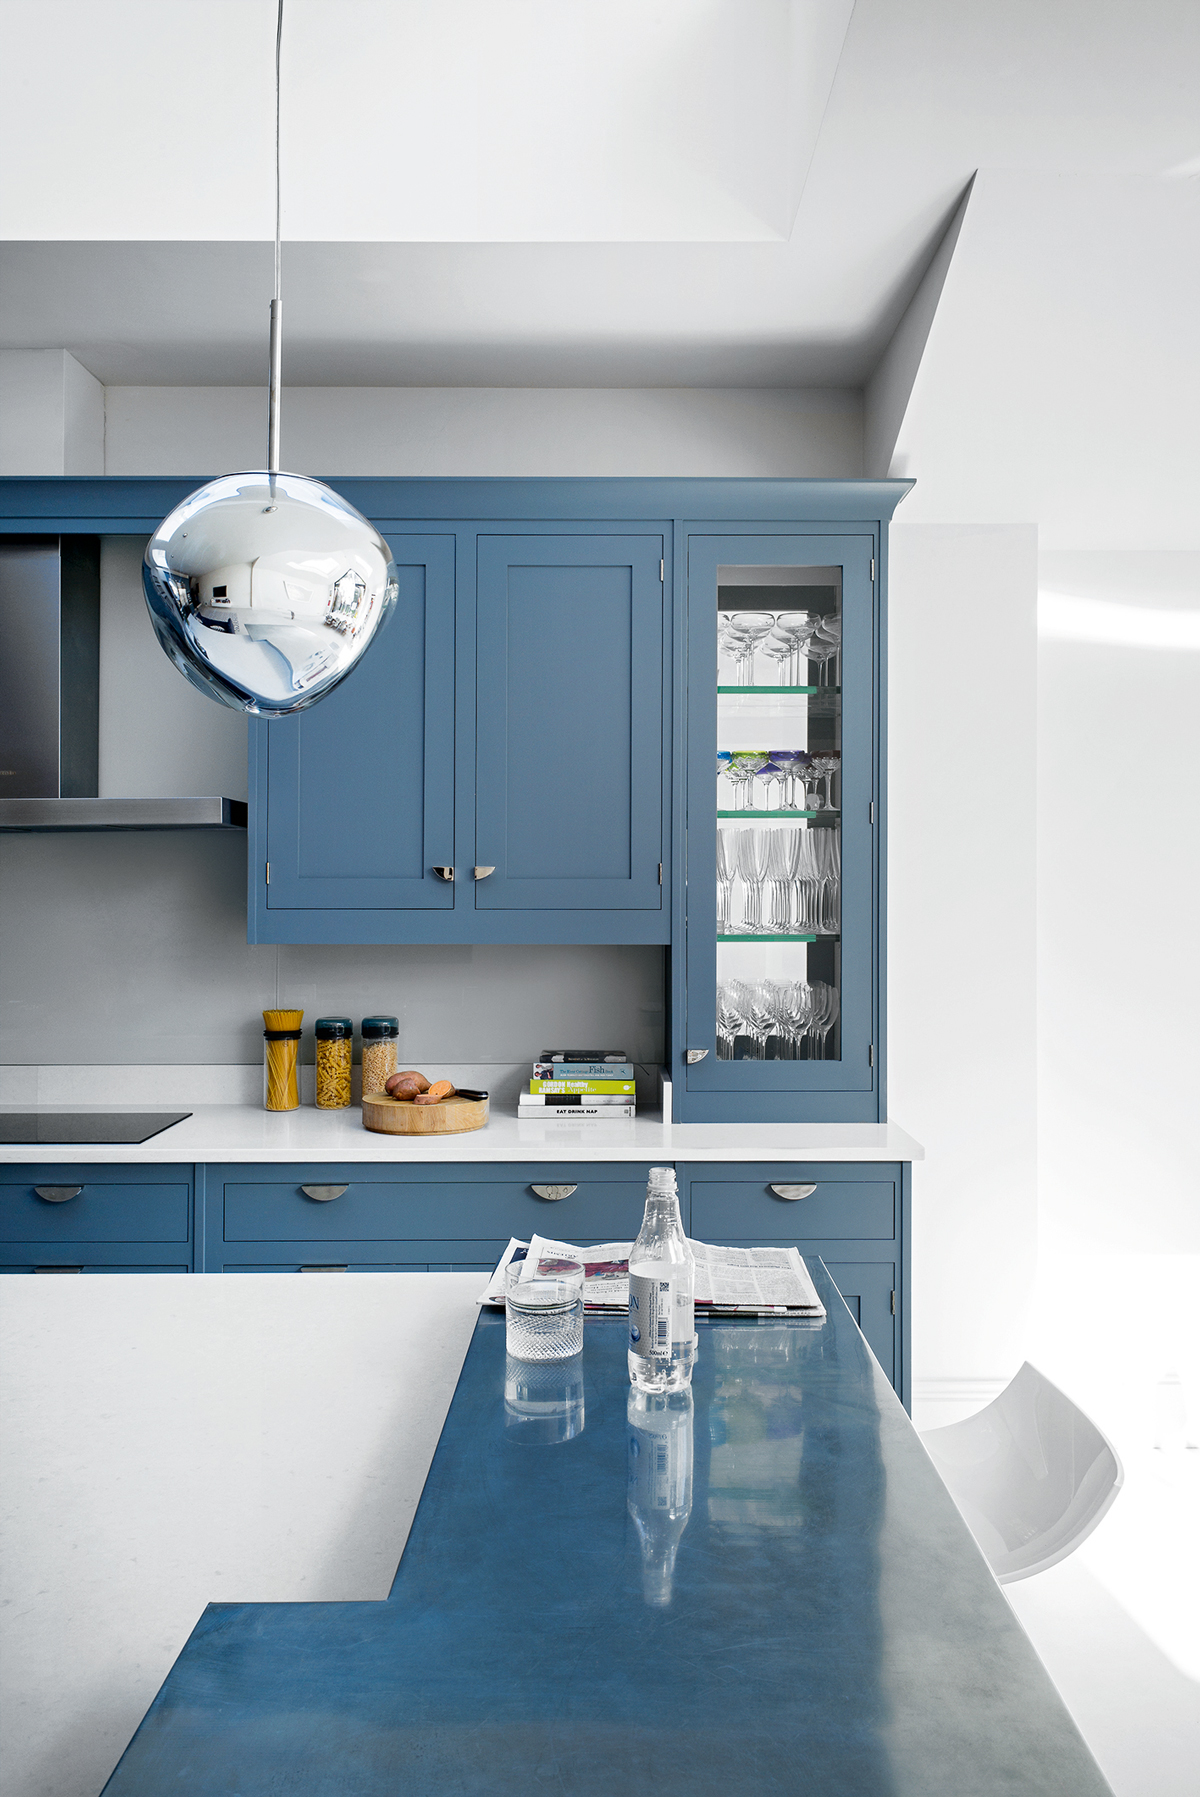 Tour An Elegant London Family Home With A Gorgeous Kitchen Extension